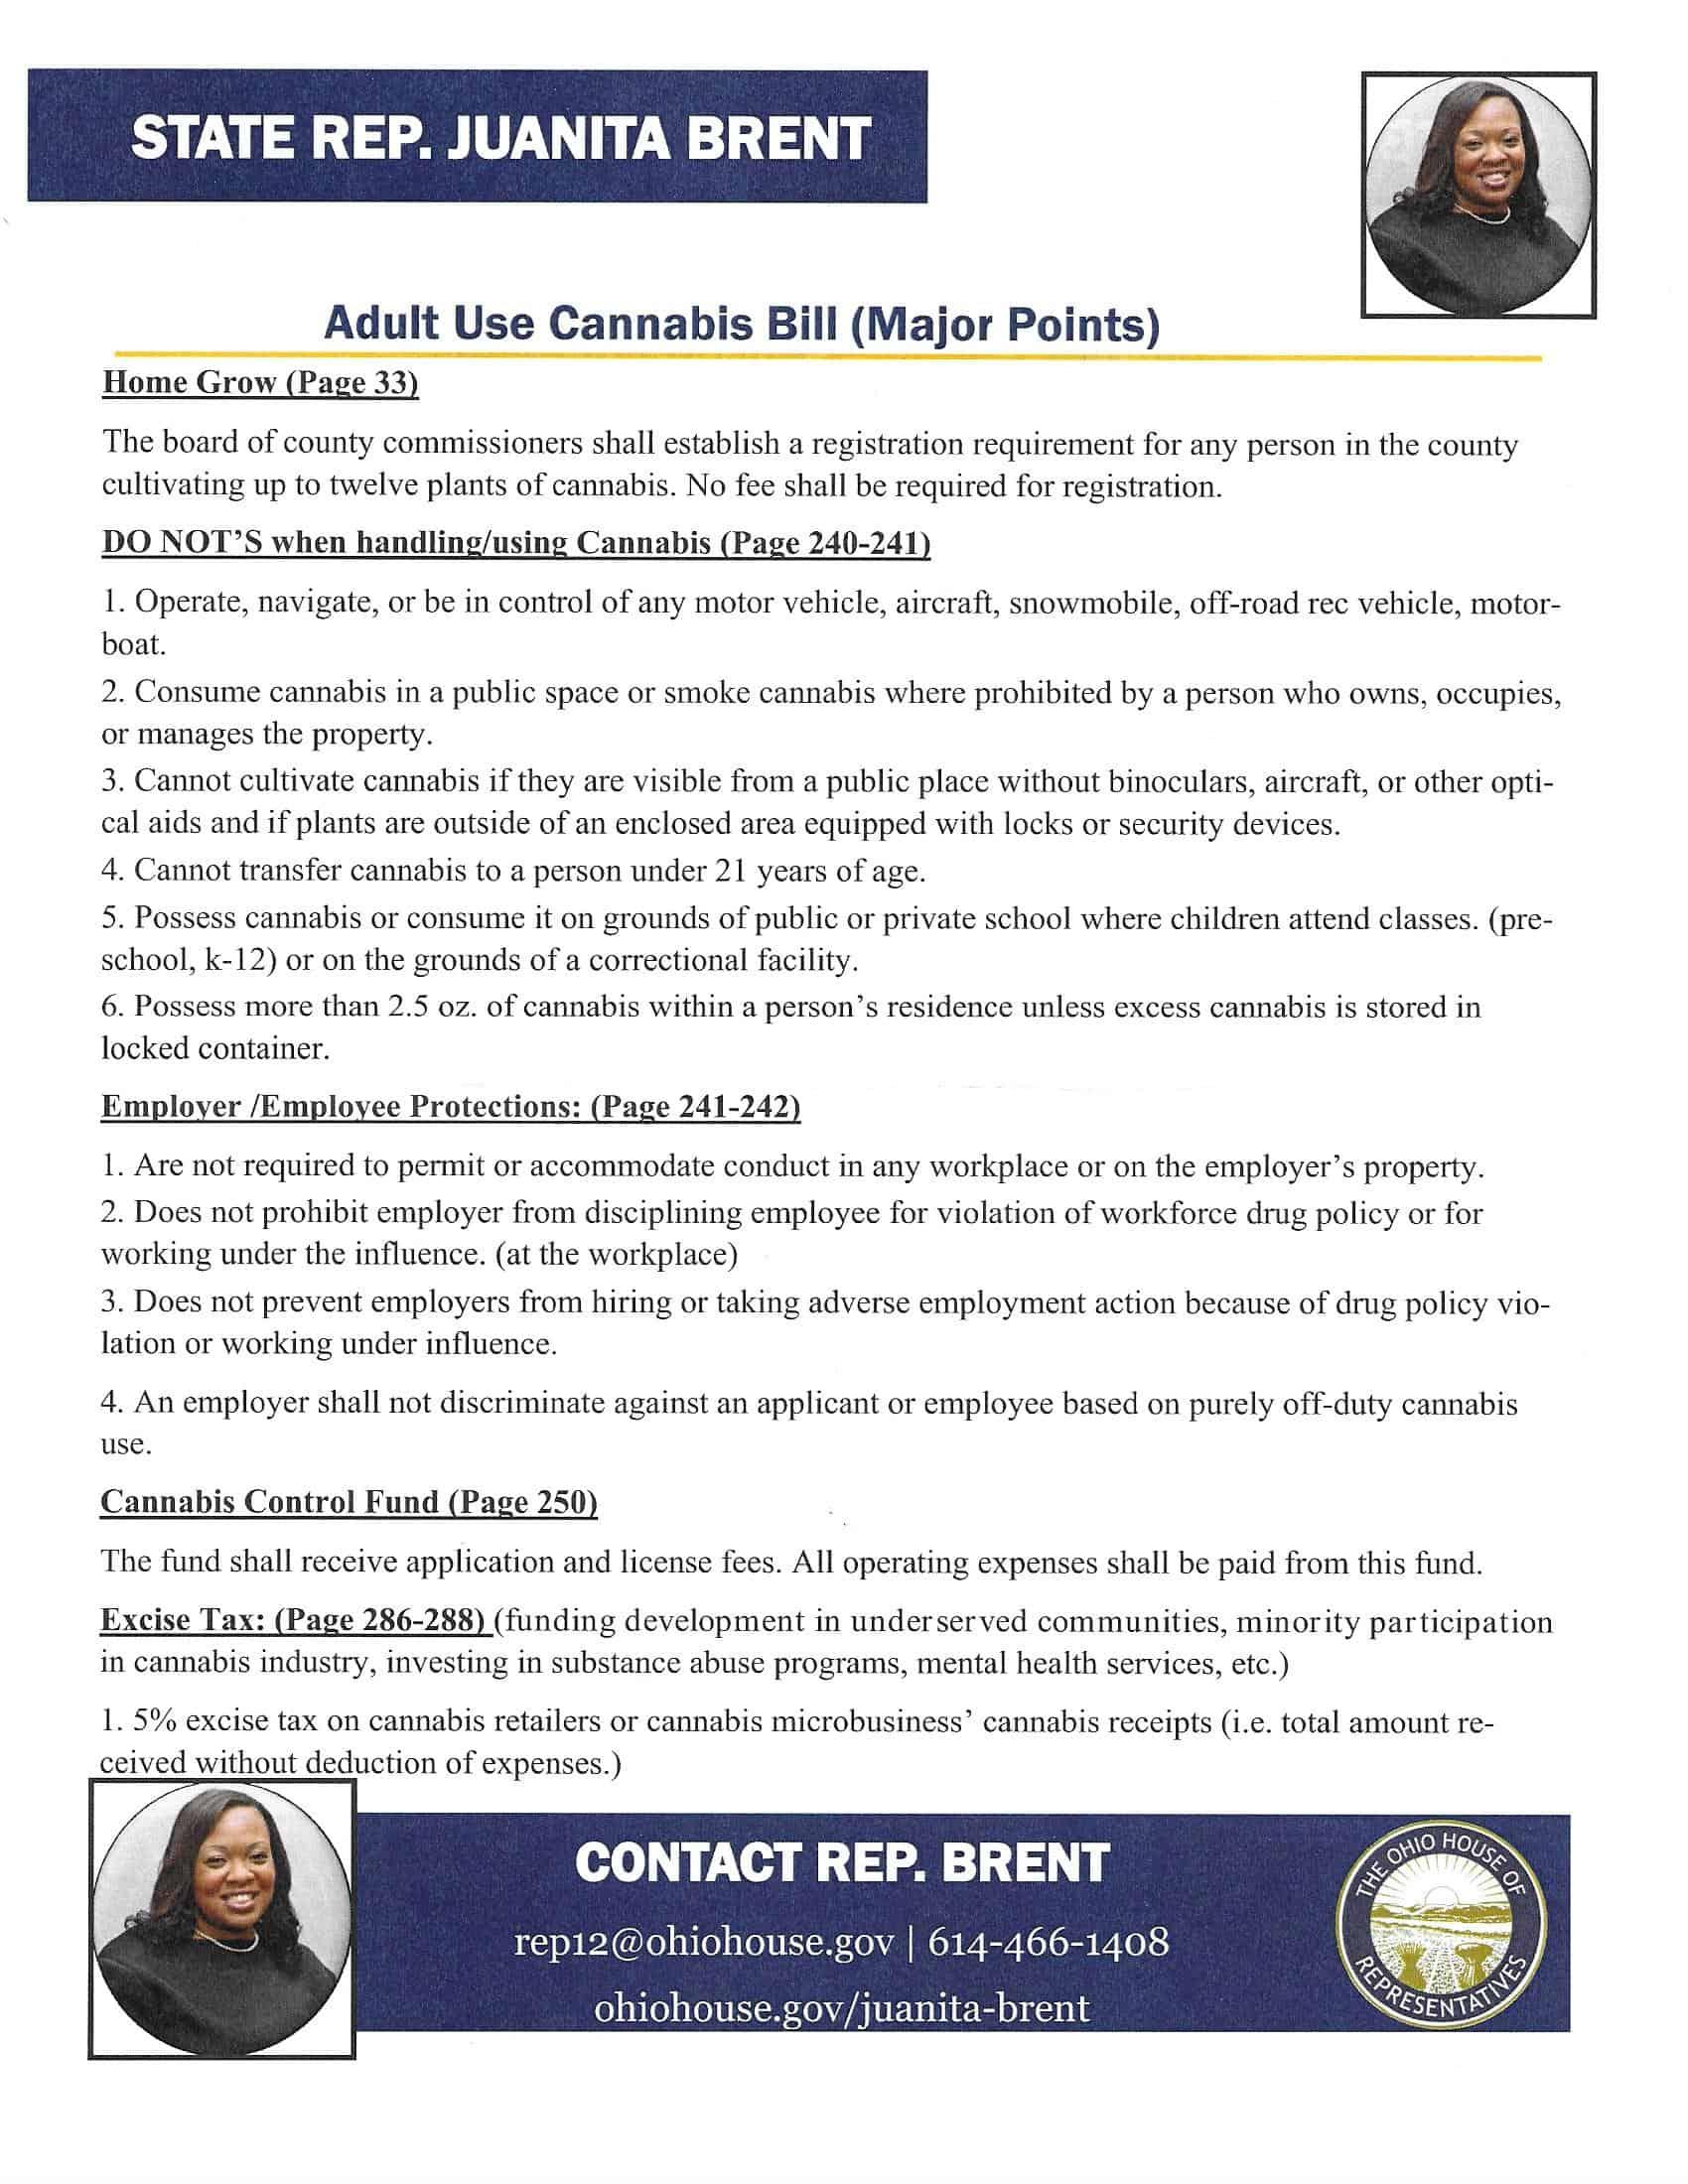 Juanita Brent Adult Use Proposal 2020 Page 2